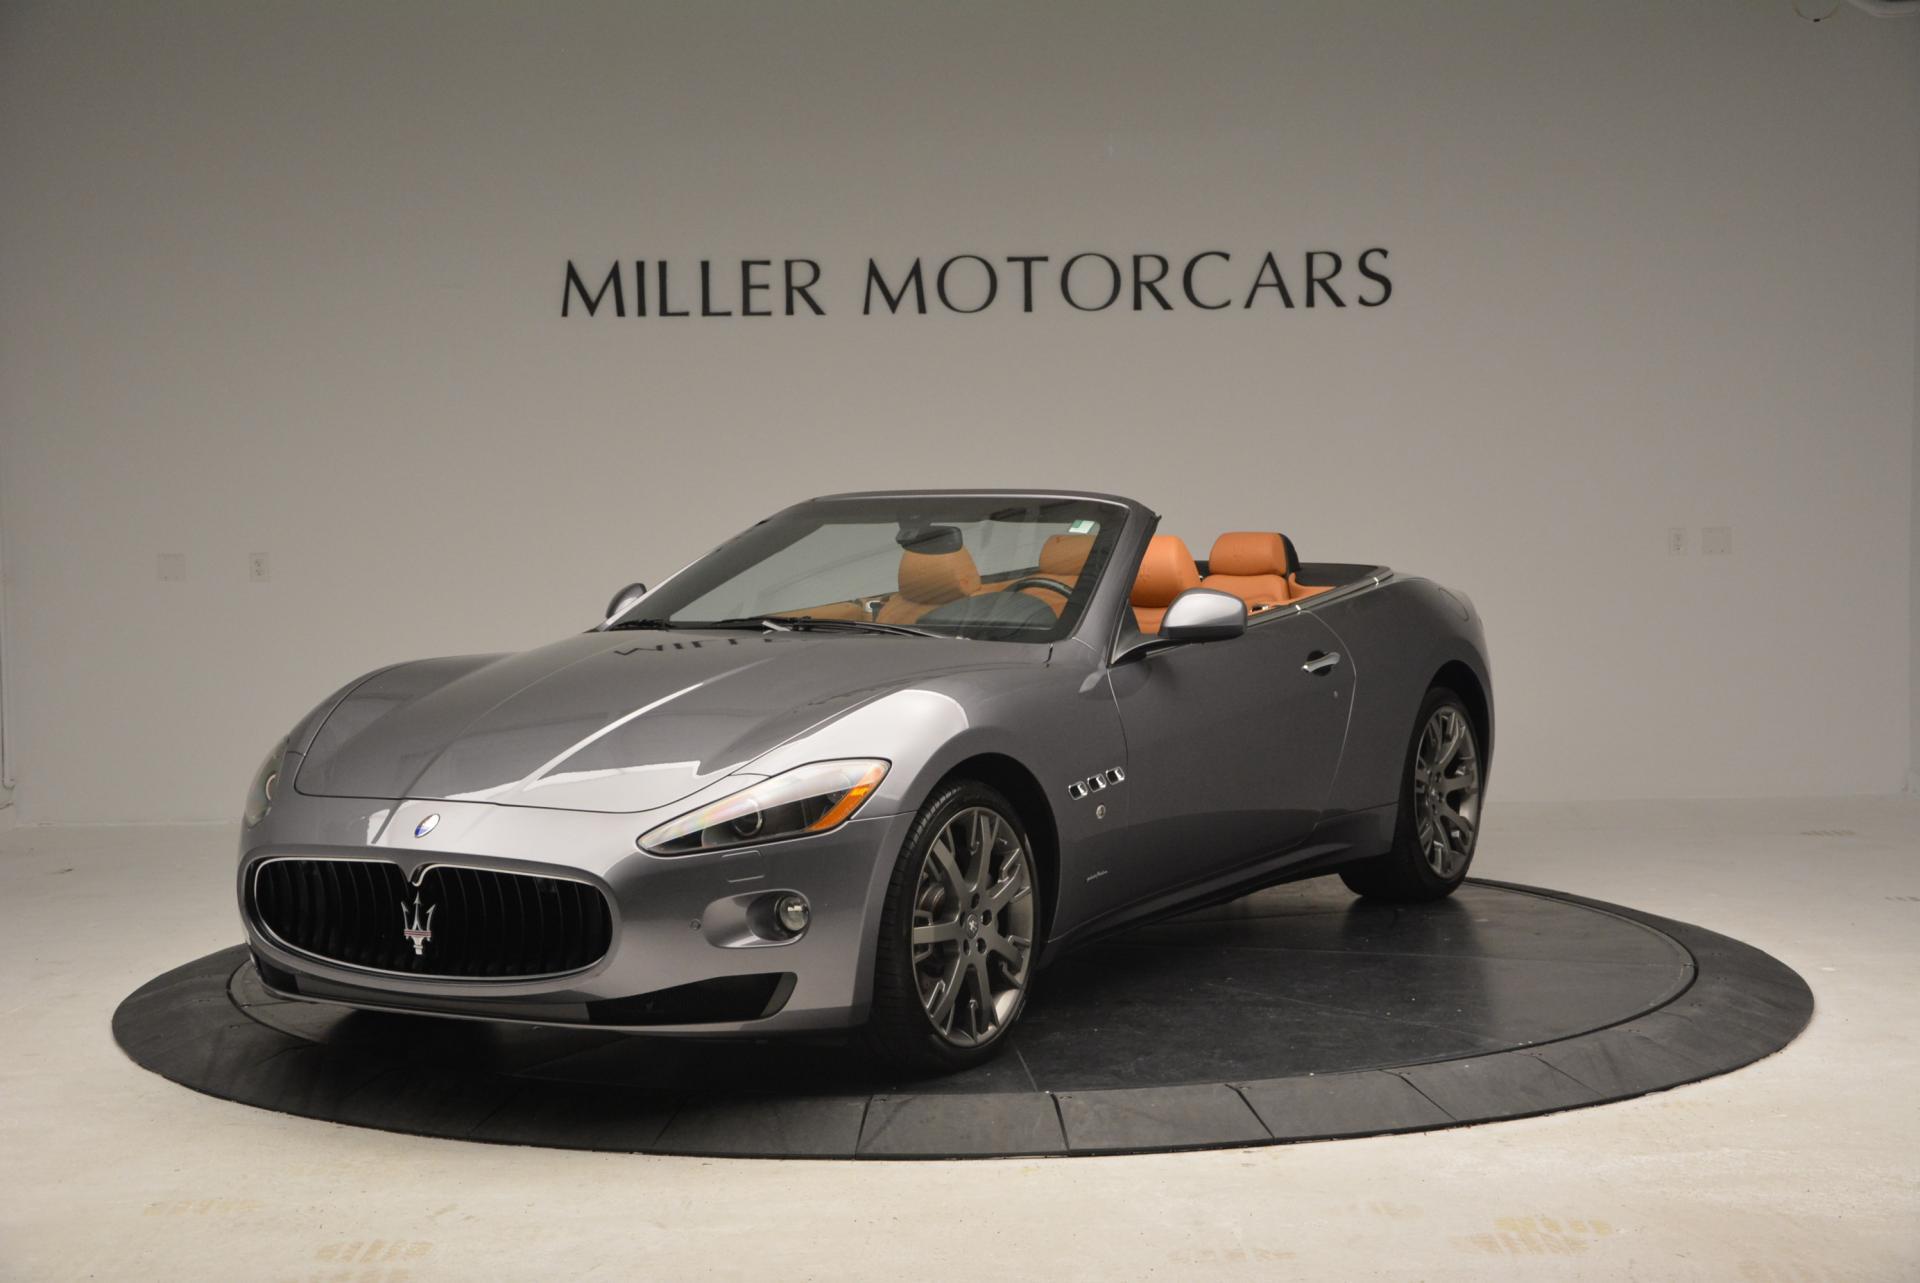 Used 2012 Maserati GranTurismo  For Sale In Westport, CT 161_main